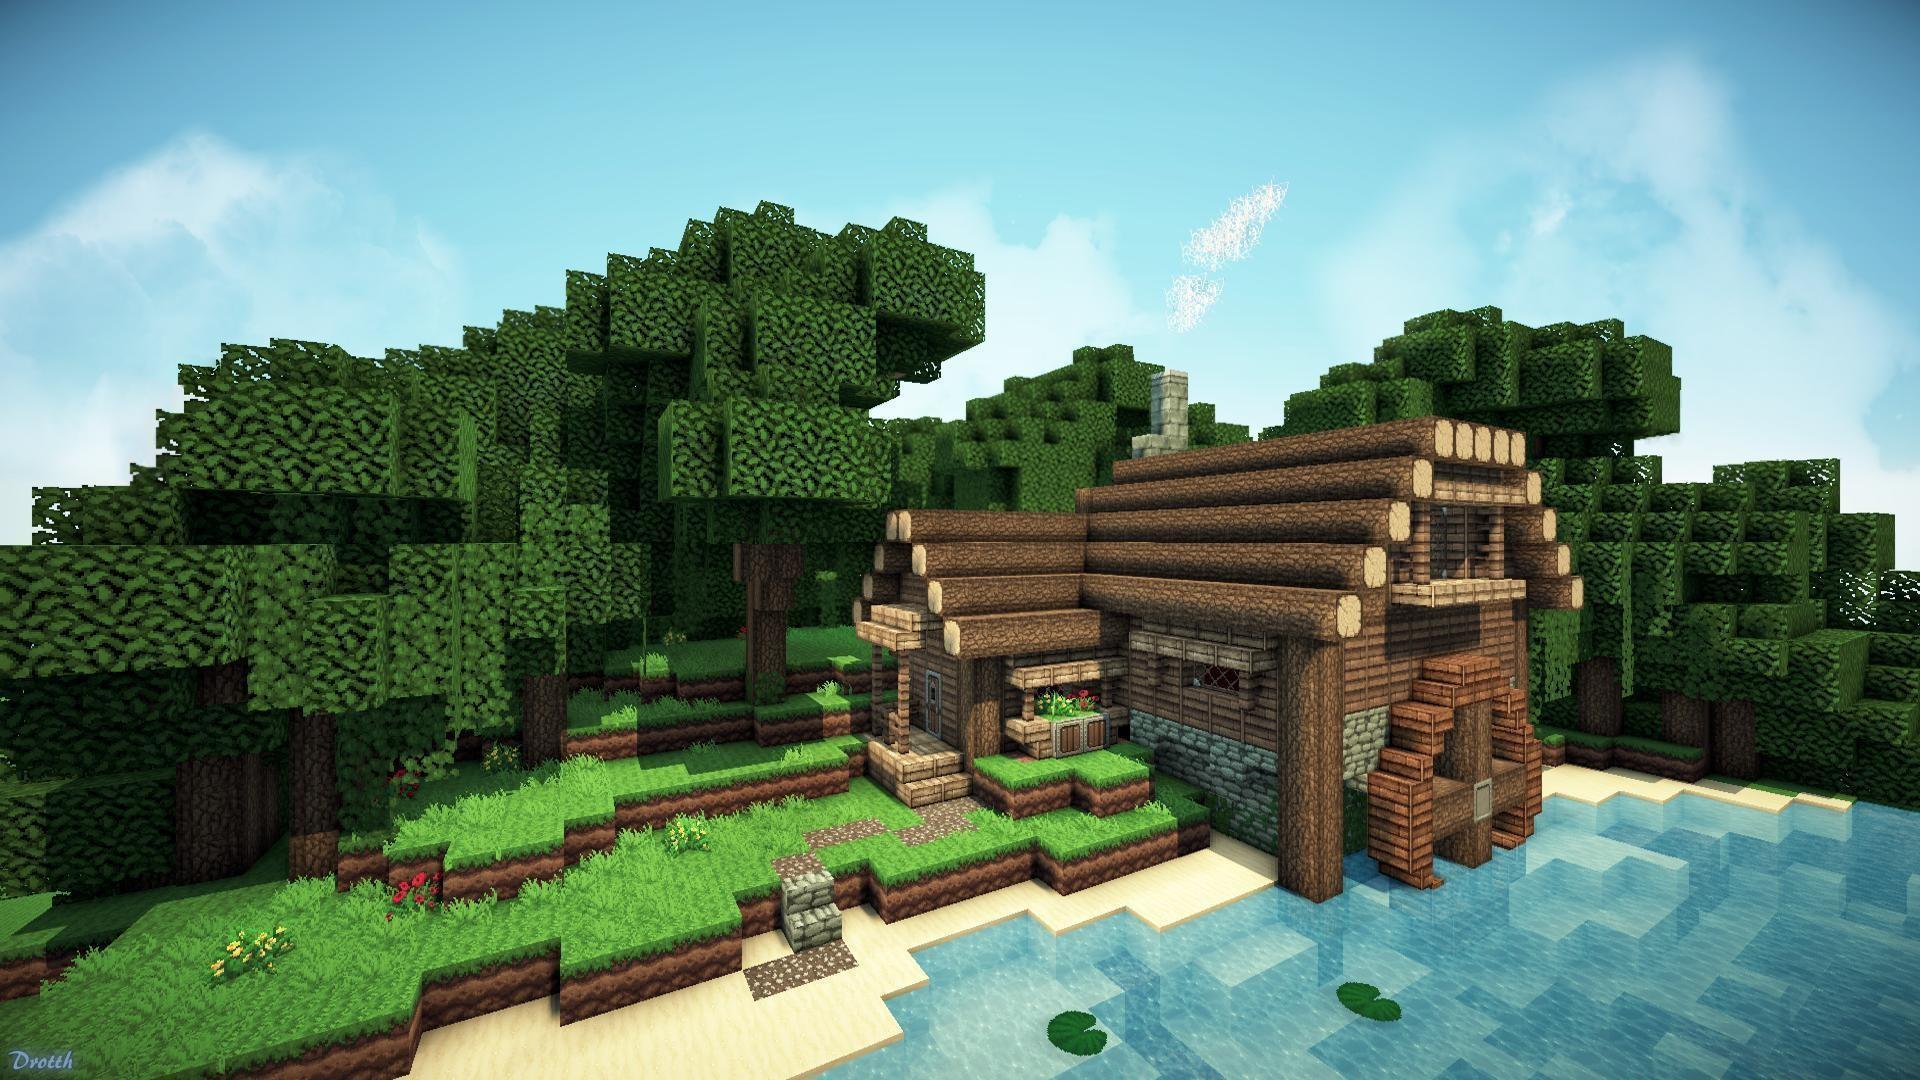 Simple Wallpaper Minecraft Beach - 430048-new-epic-minecraft-background-1920x1080  Best Photo Reference_87089.jpg